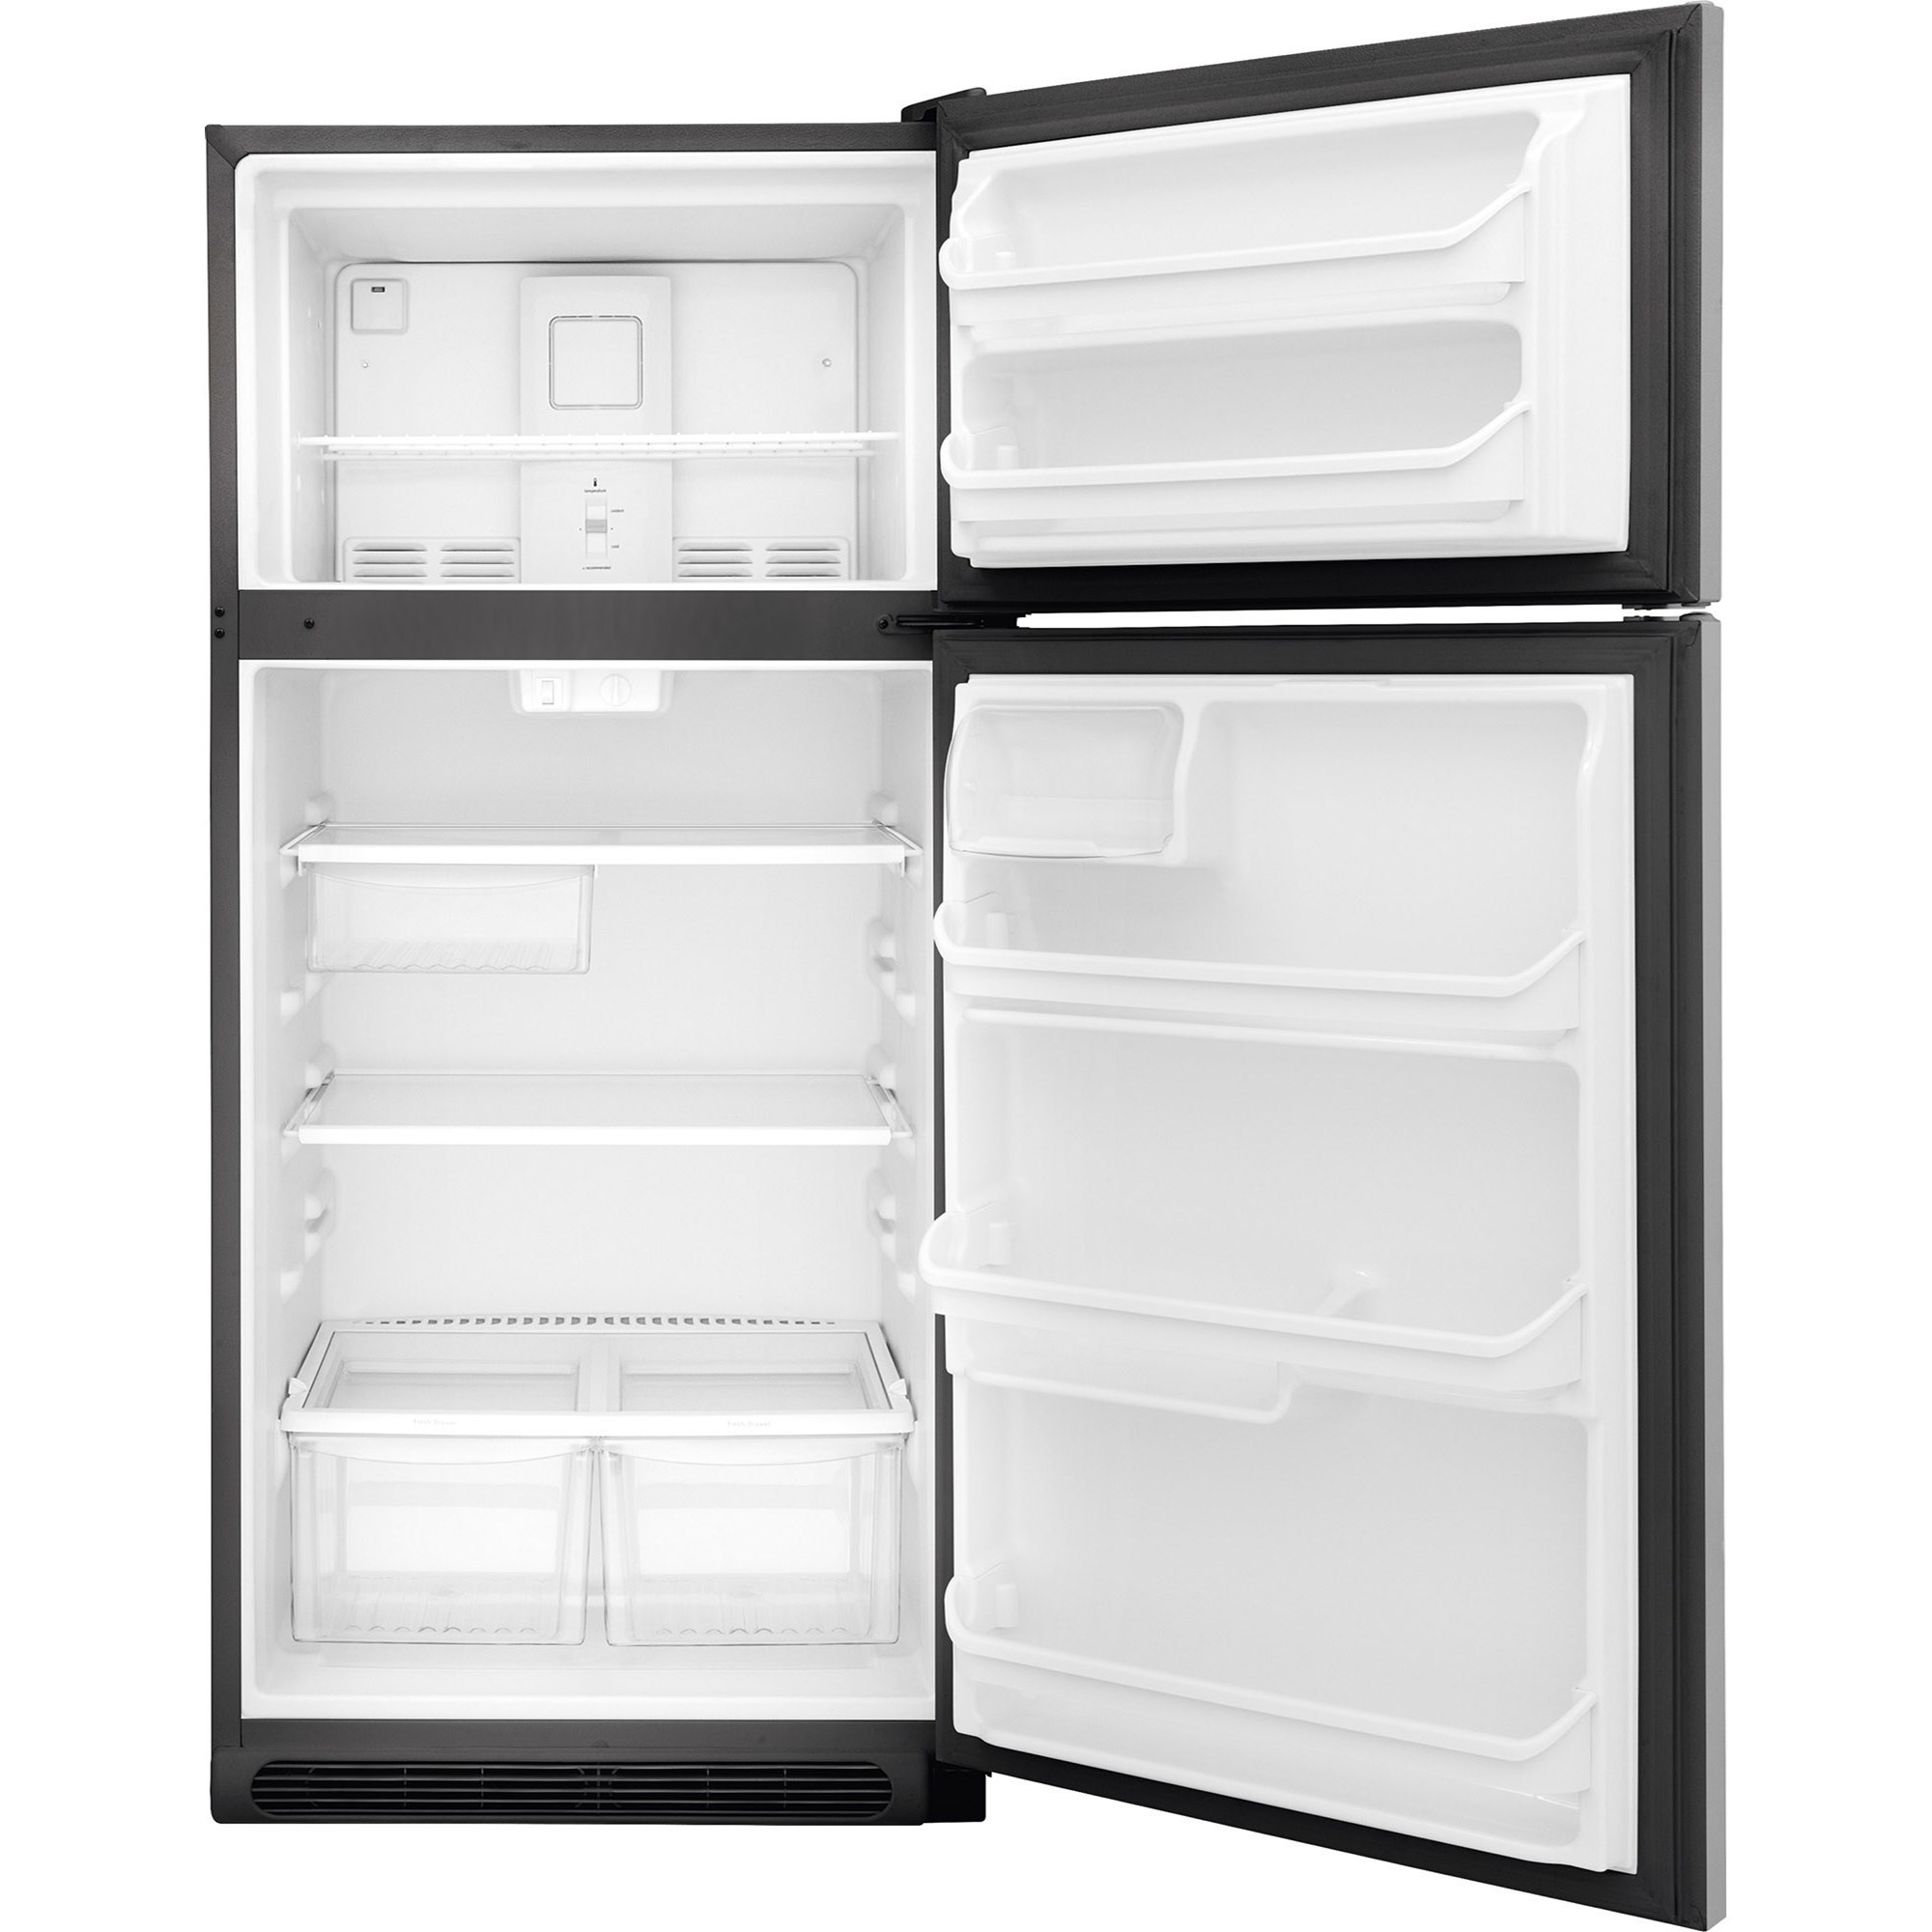 frigidaire fftr1821td18 cu ft top freezer refrigerator furniture and appliancemart. Black Bedroom Furniture Sets. Home Design Ideas